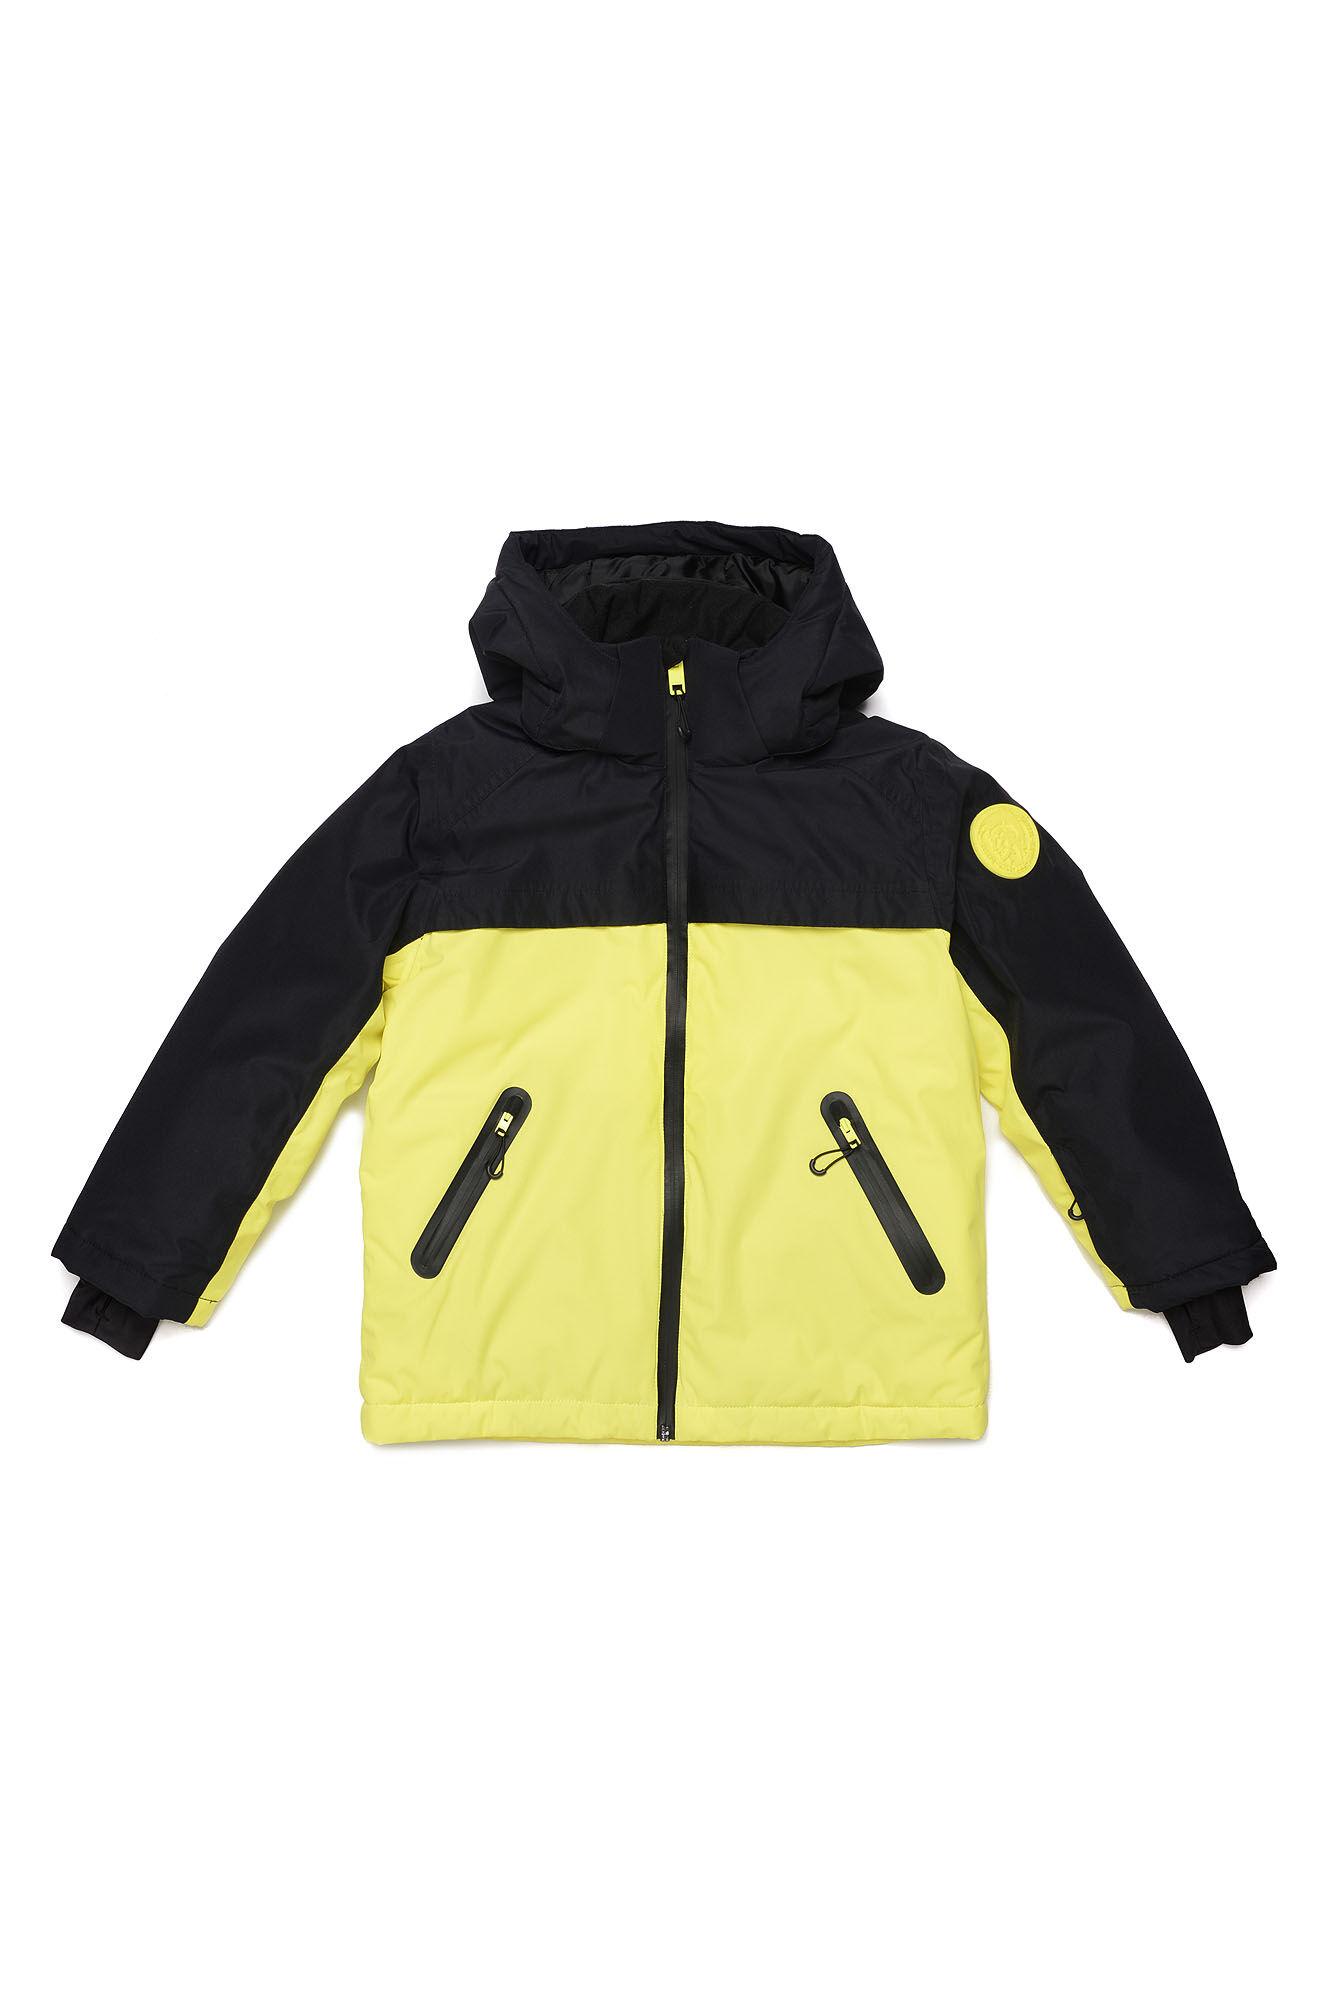 Jpolar-Ski Jacket - Diesel Kid